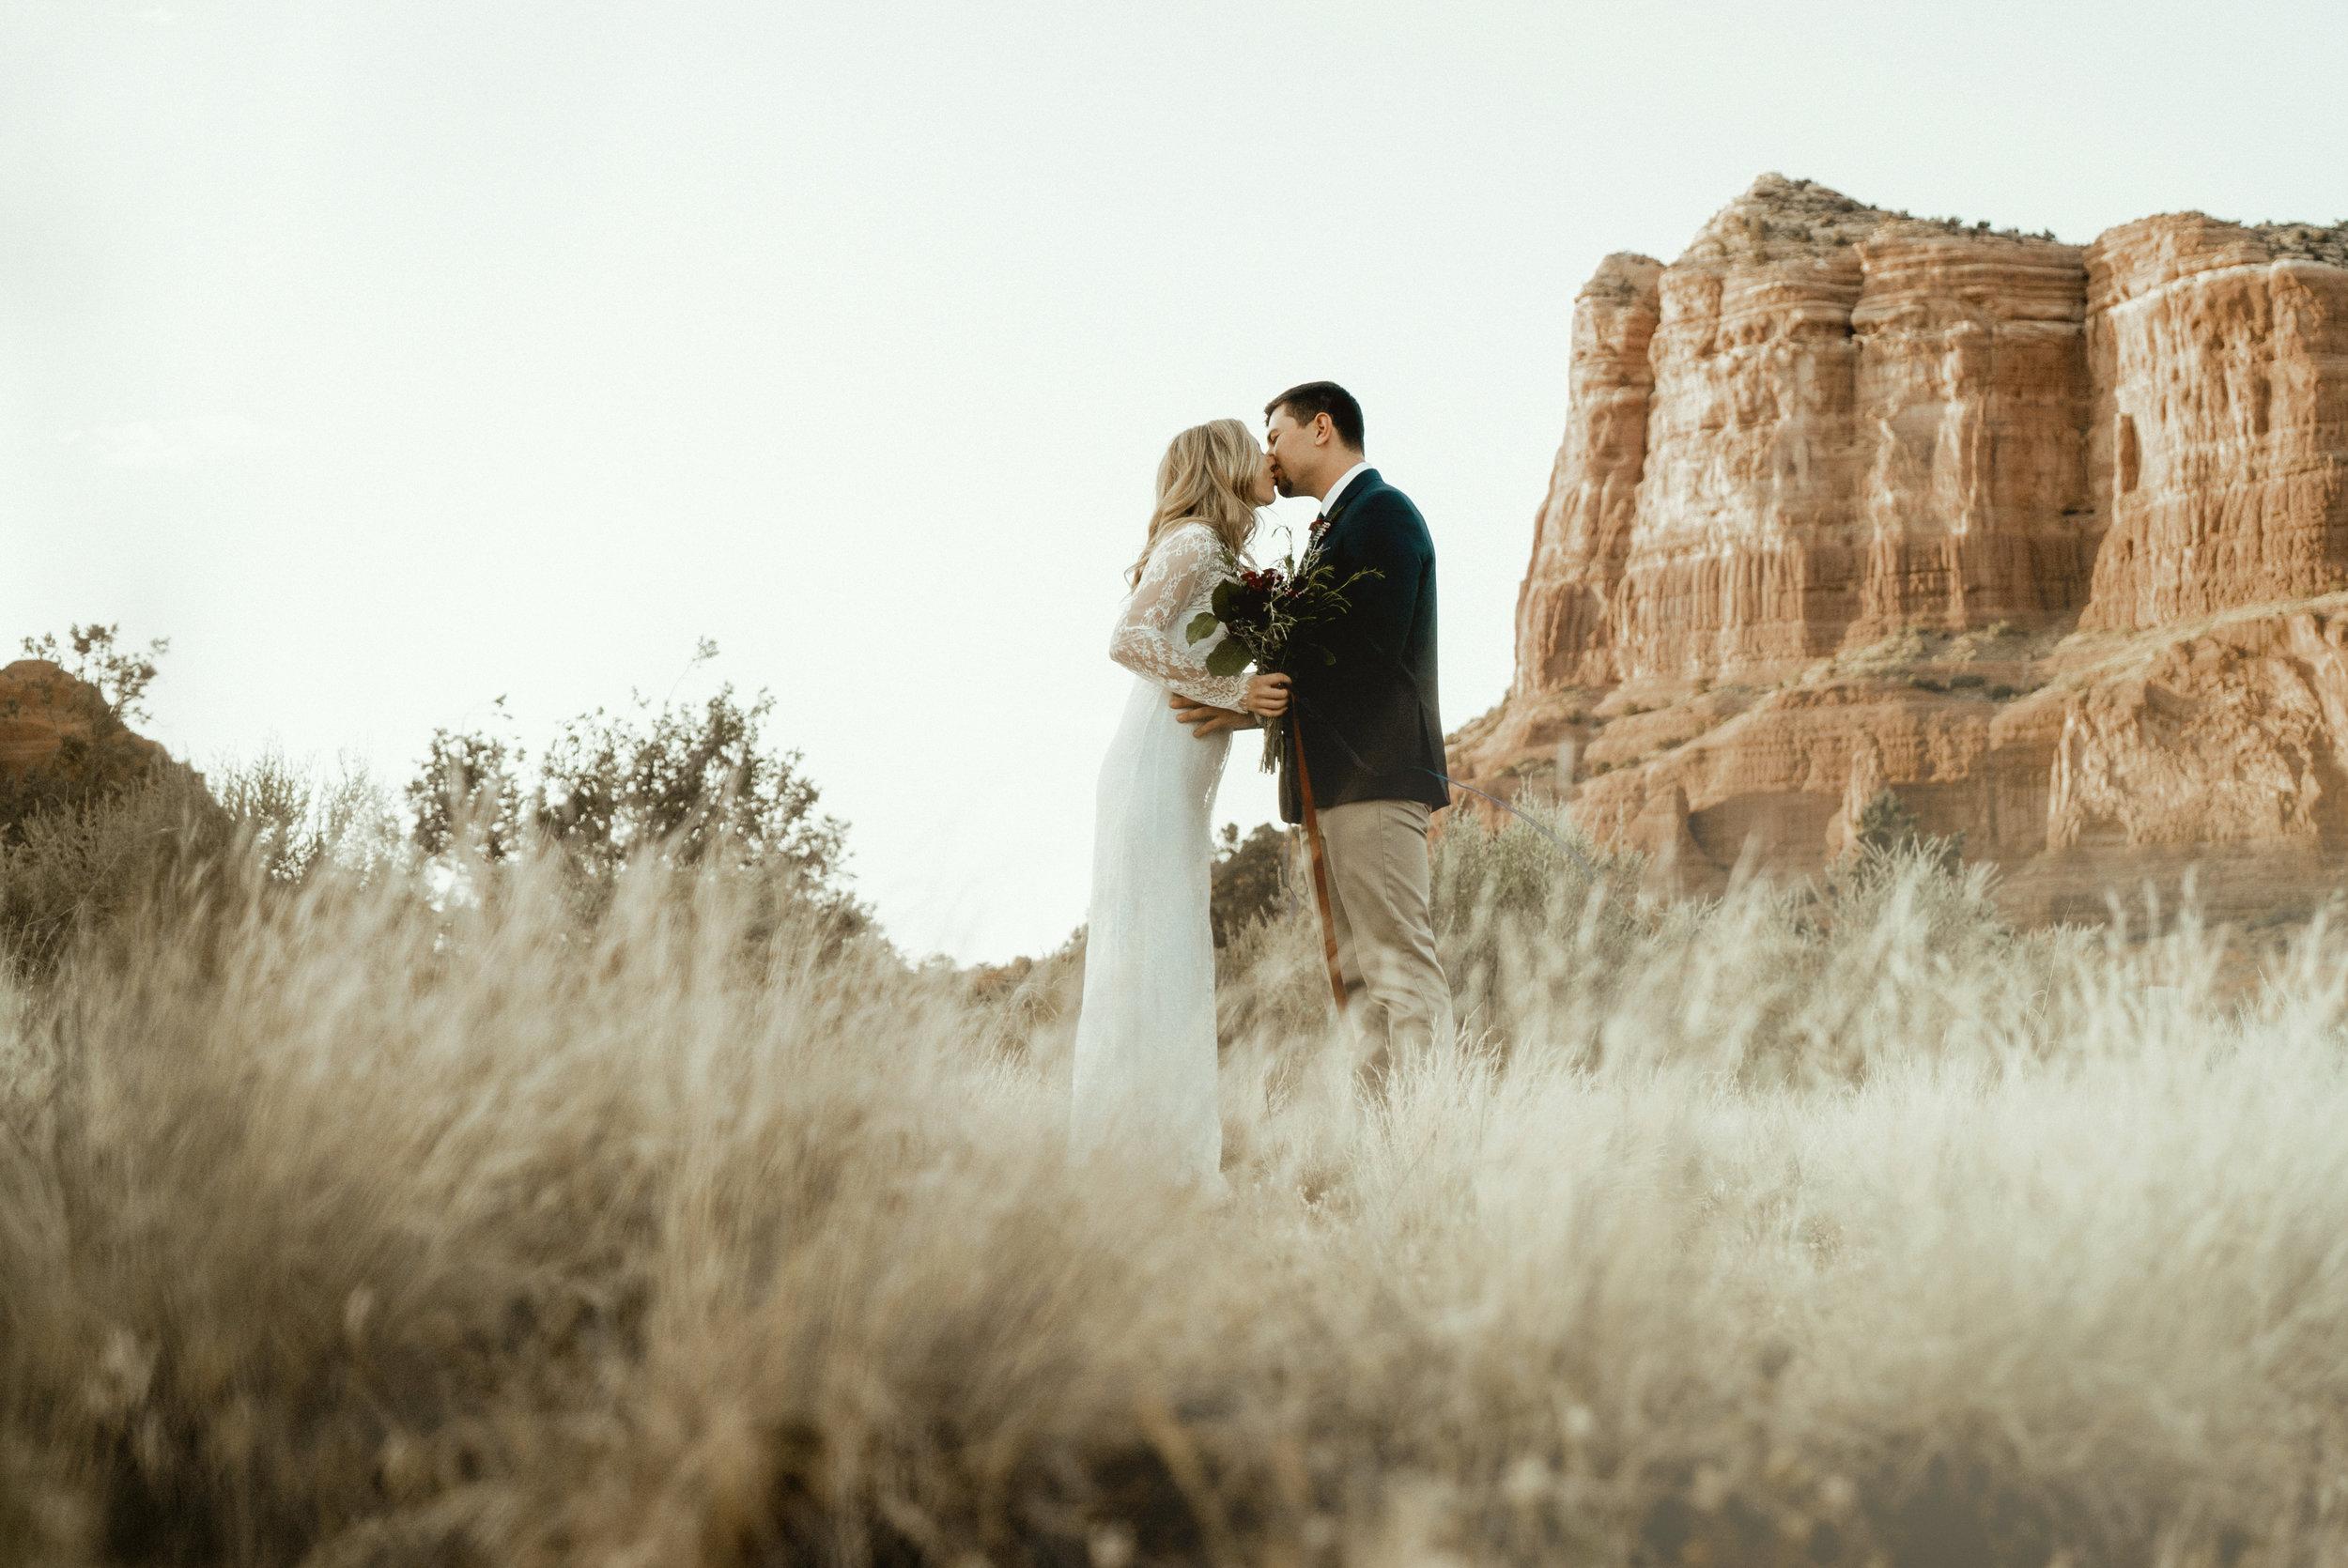 Brad & Taylor - Picturesque Sedona, Arizona elopement shoot